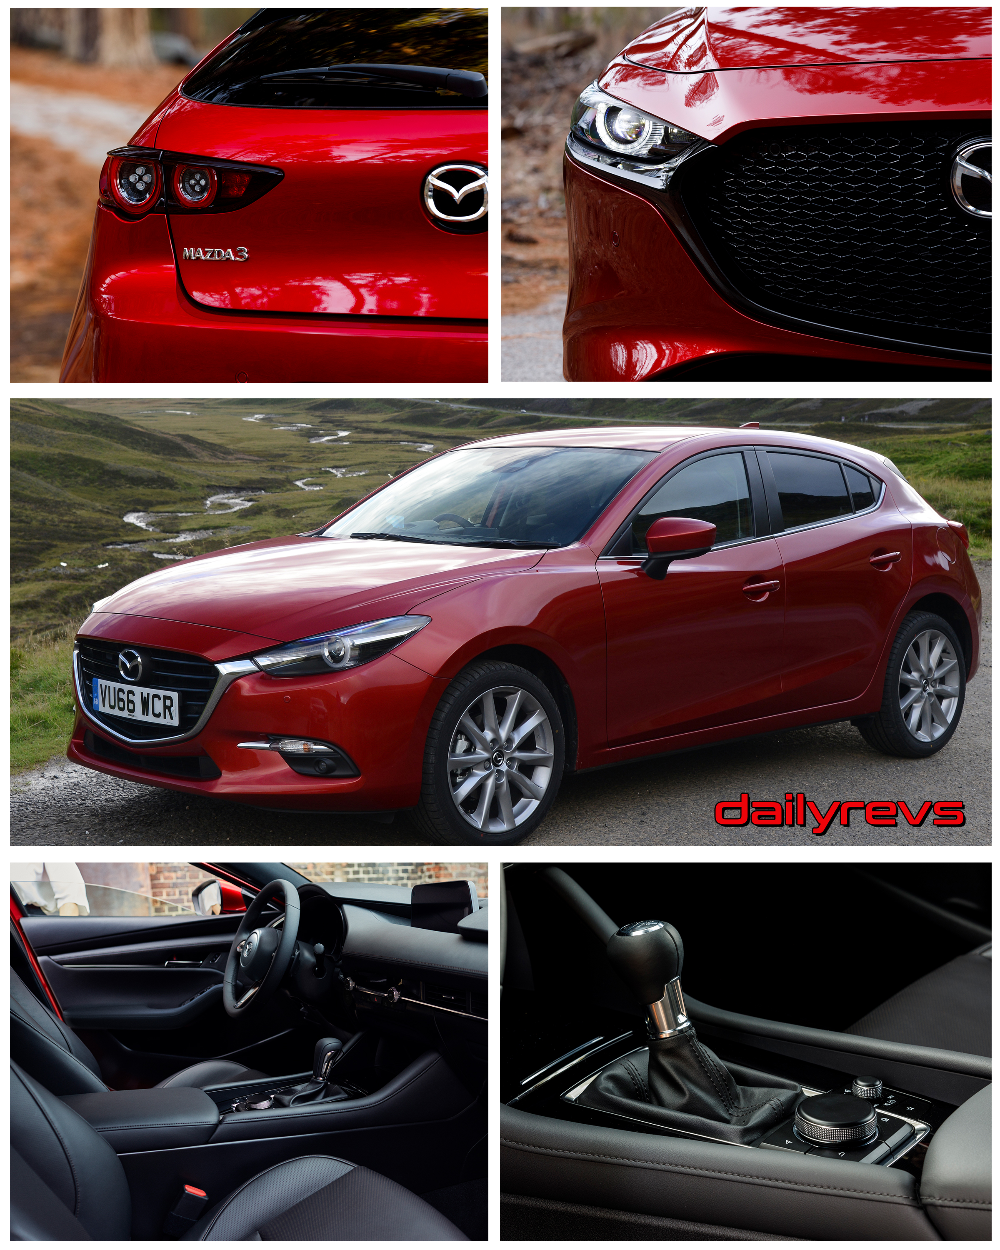 2020 Mazda 3 Mazda, Mazda 3, Fuel economy